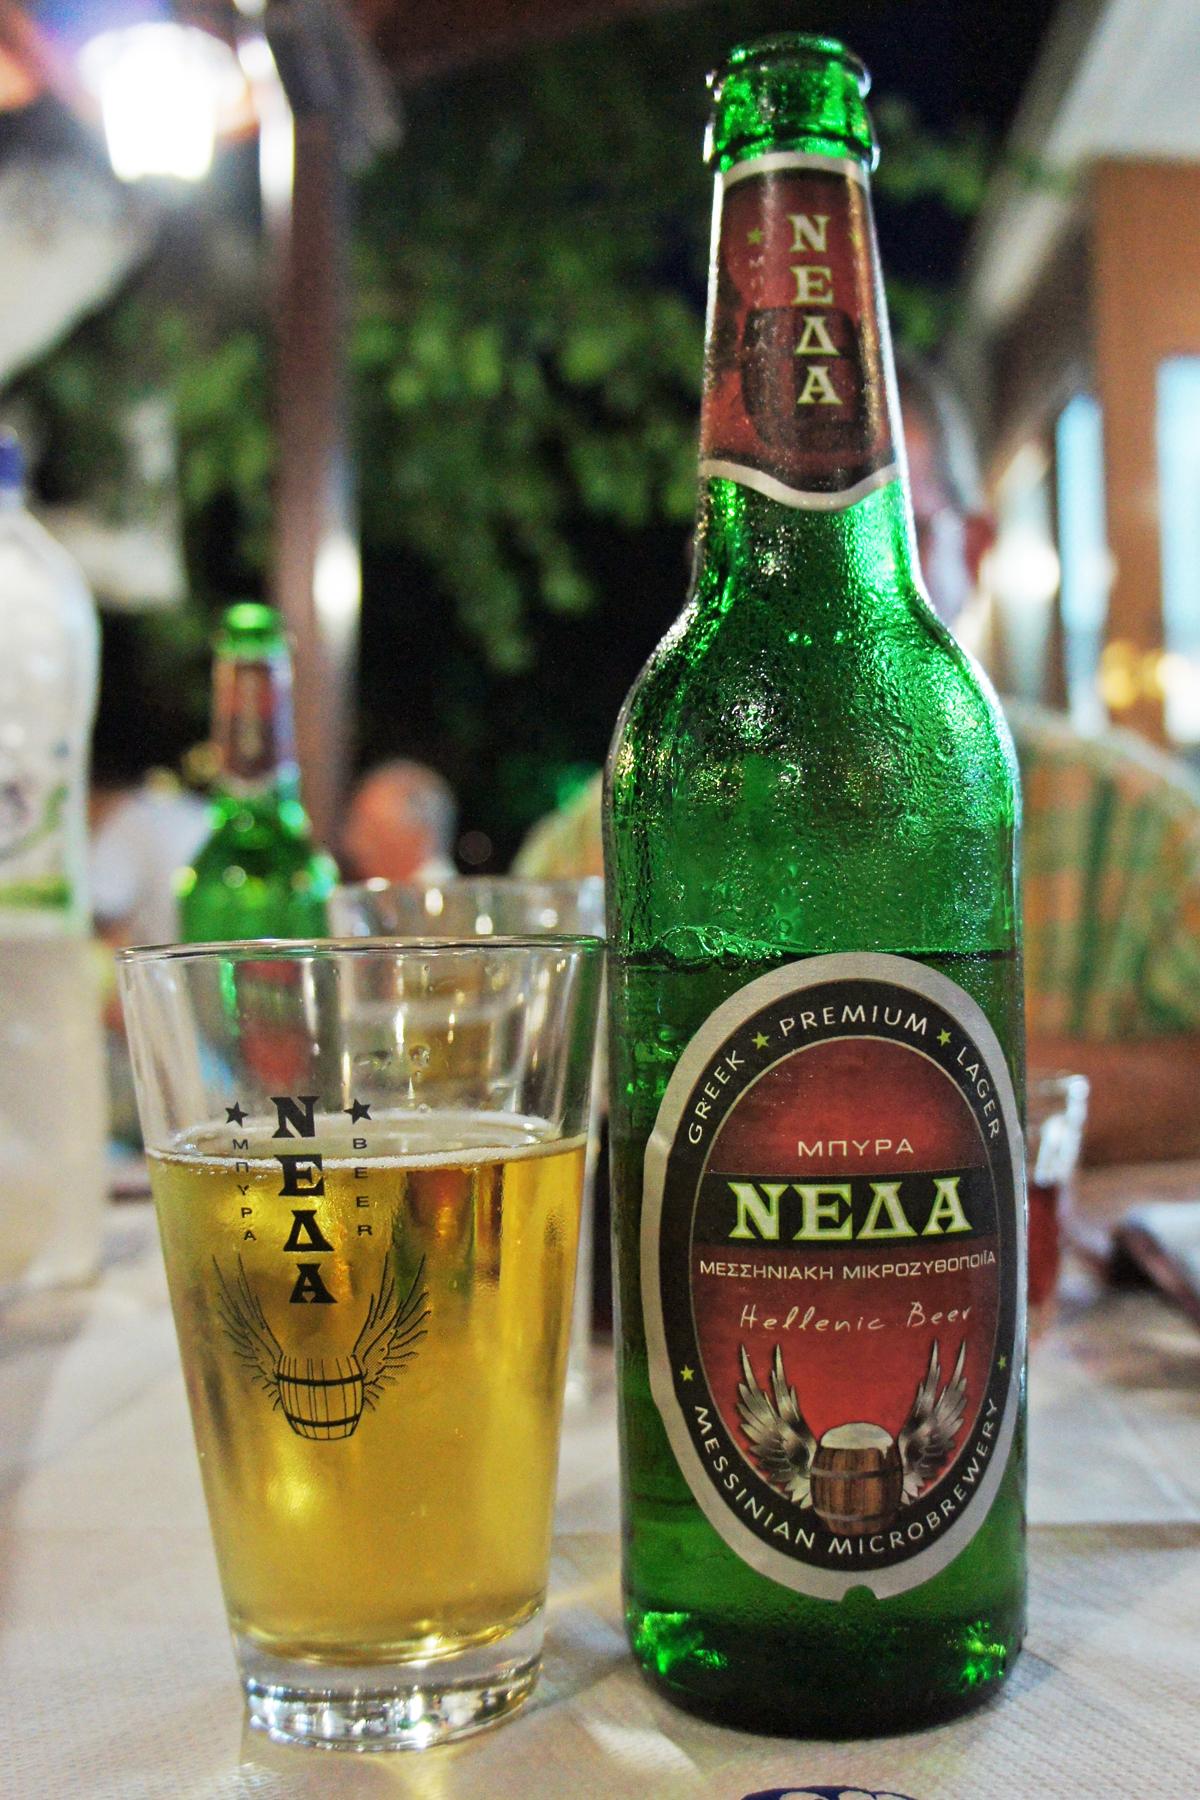 Greek beer bottle photo